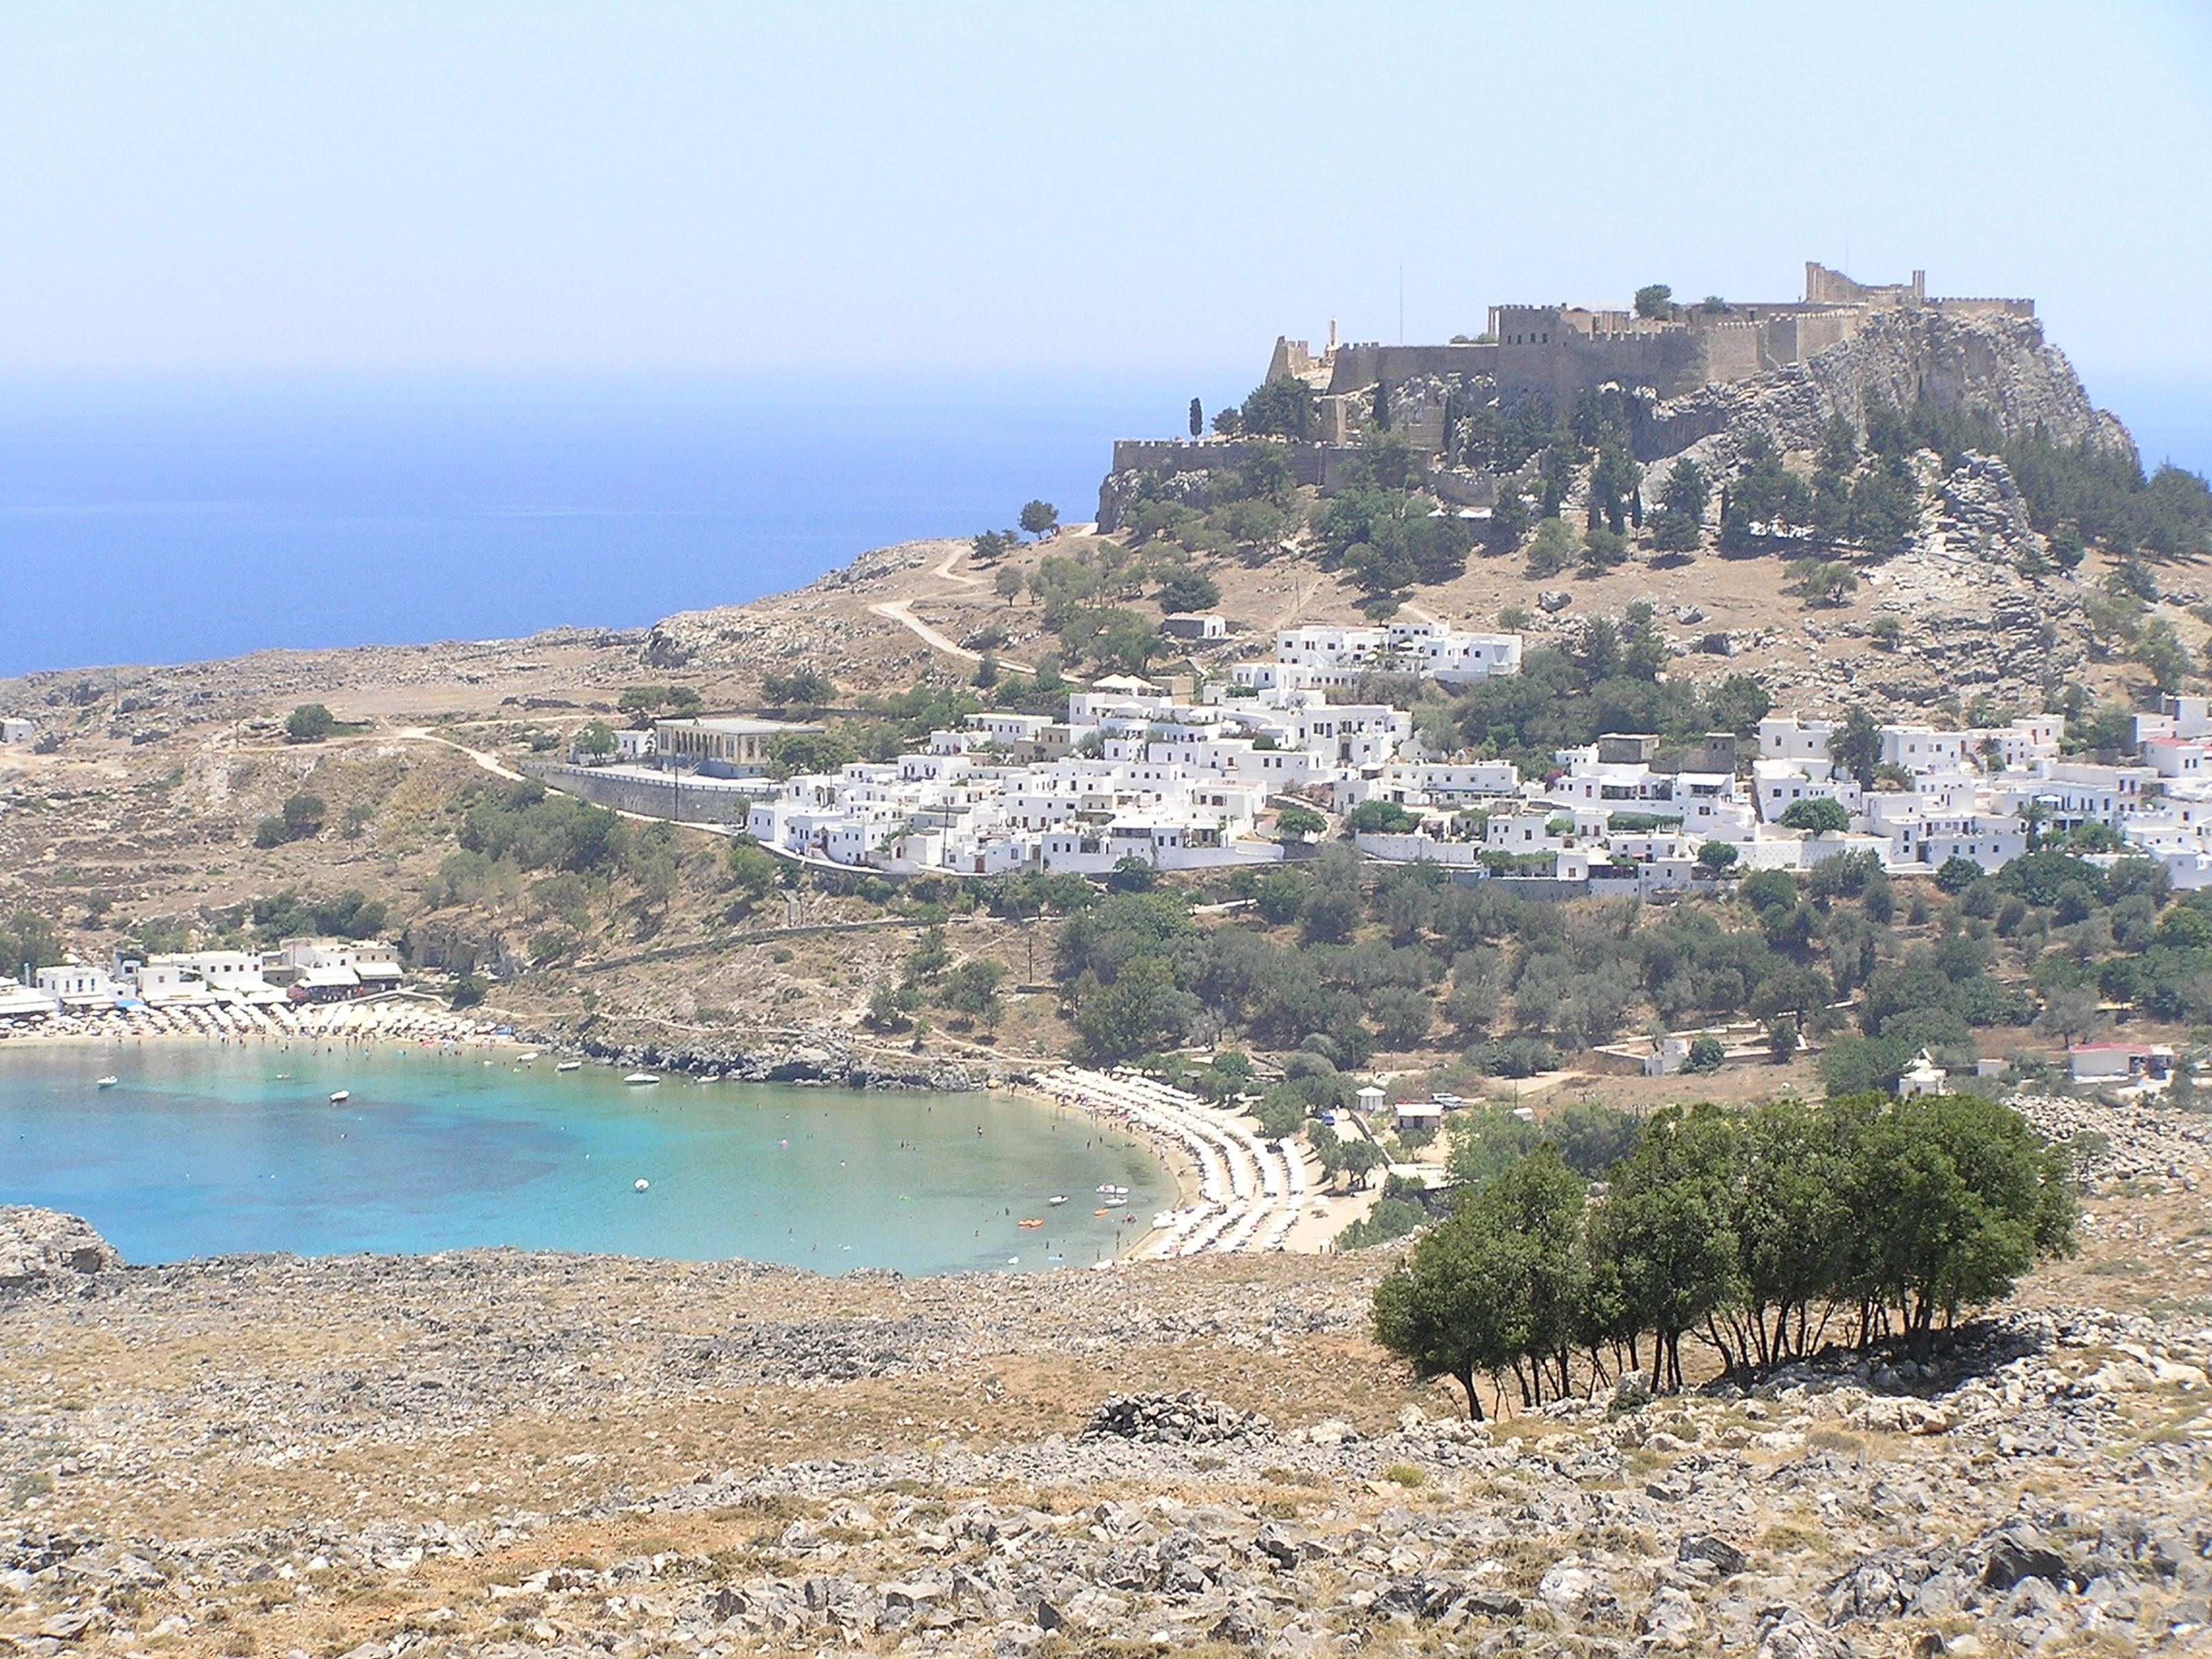 La isla de Rodas Grecia Rodas viajes e información turística Rodas Grecia